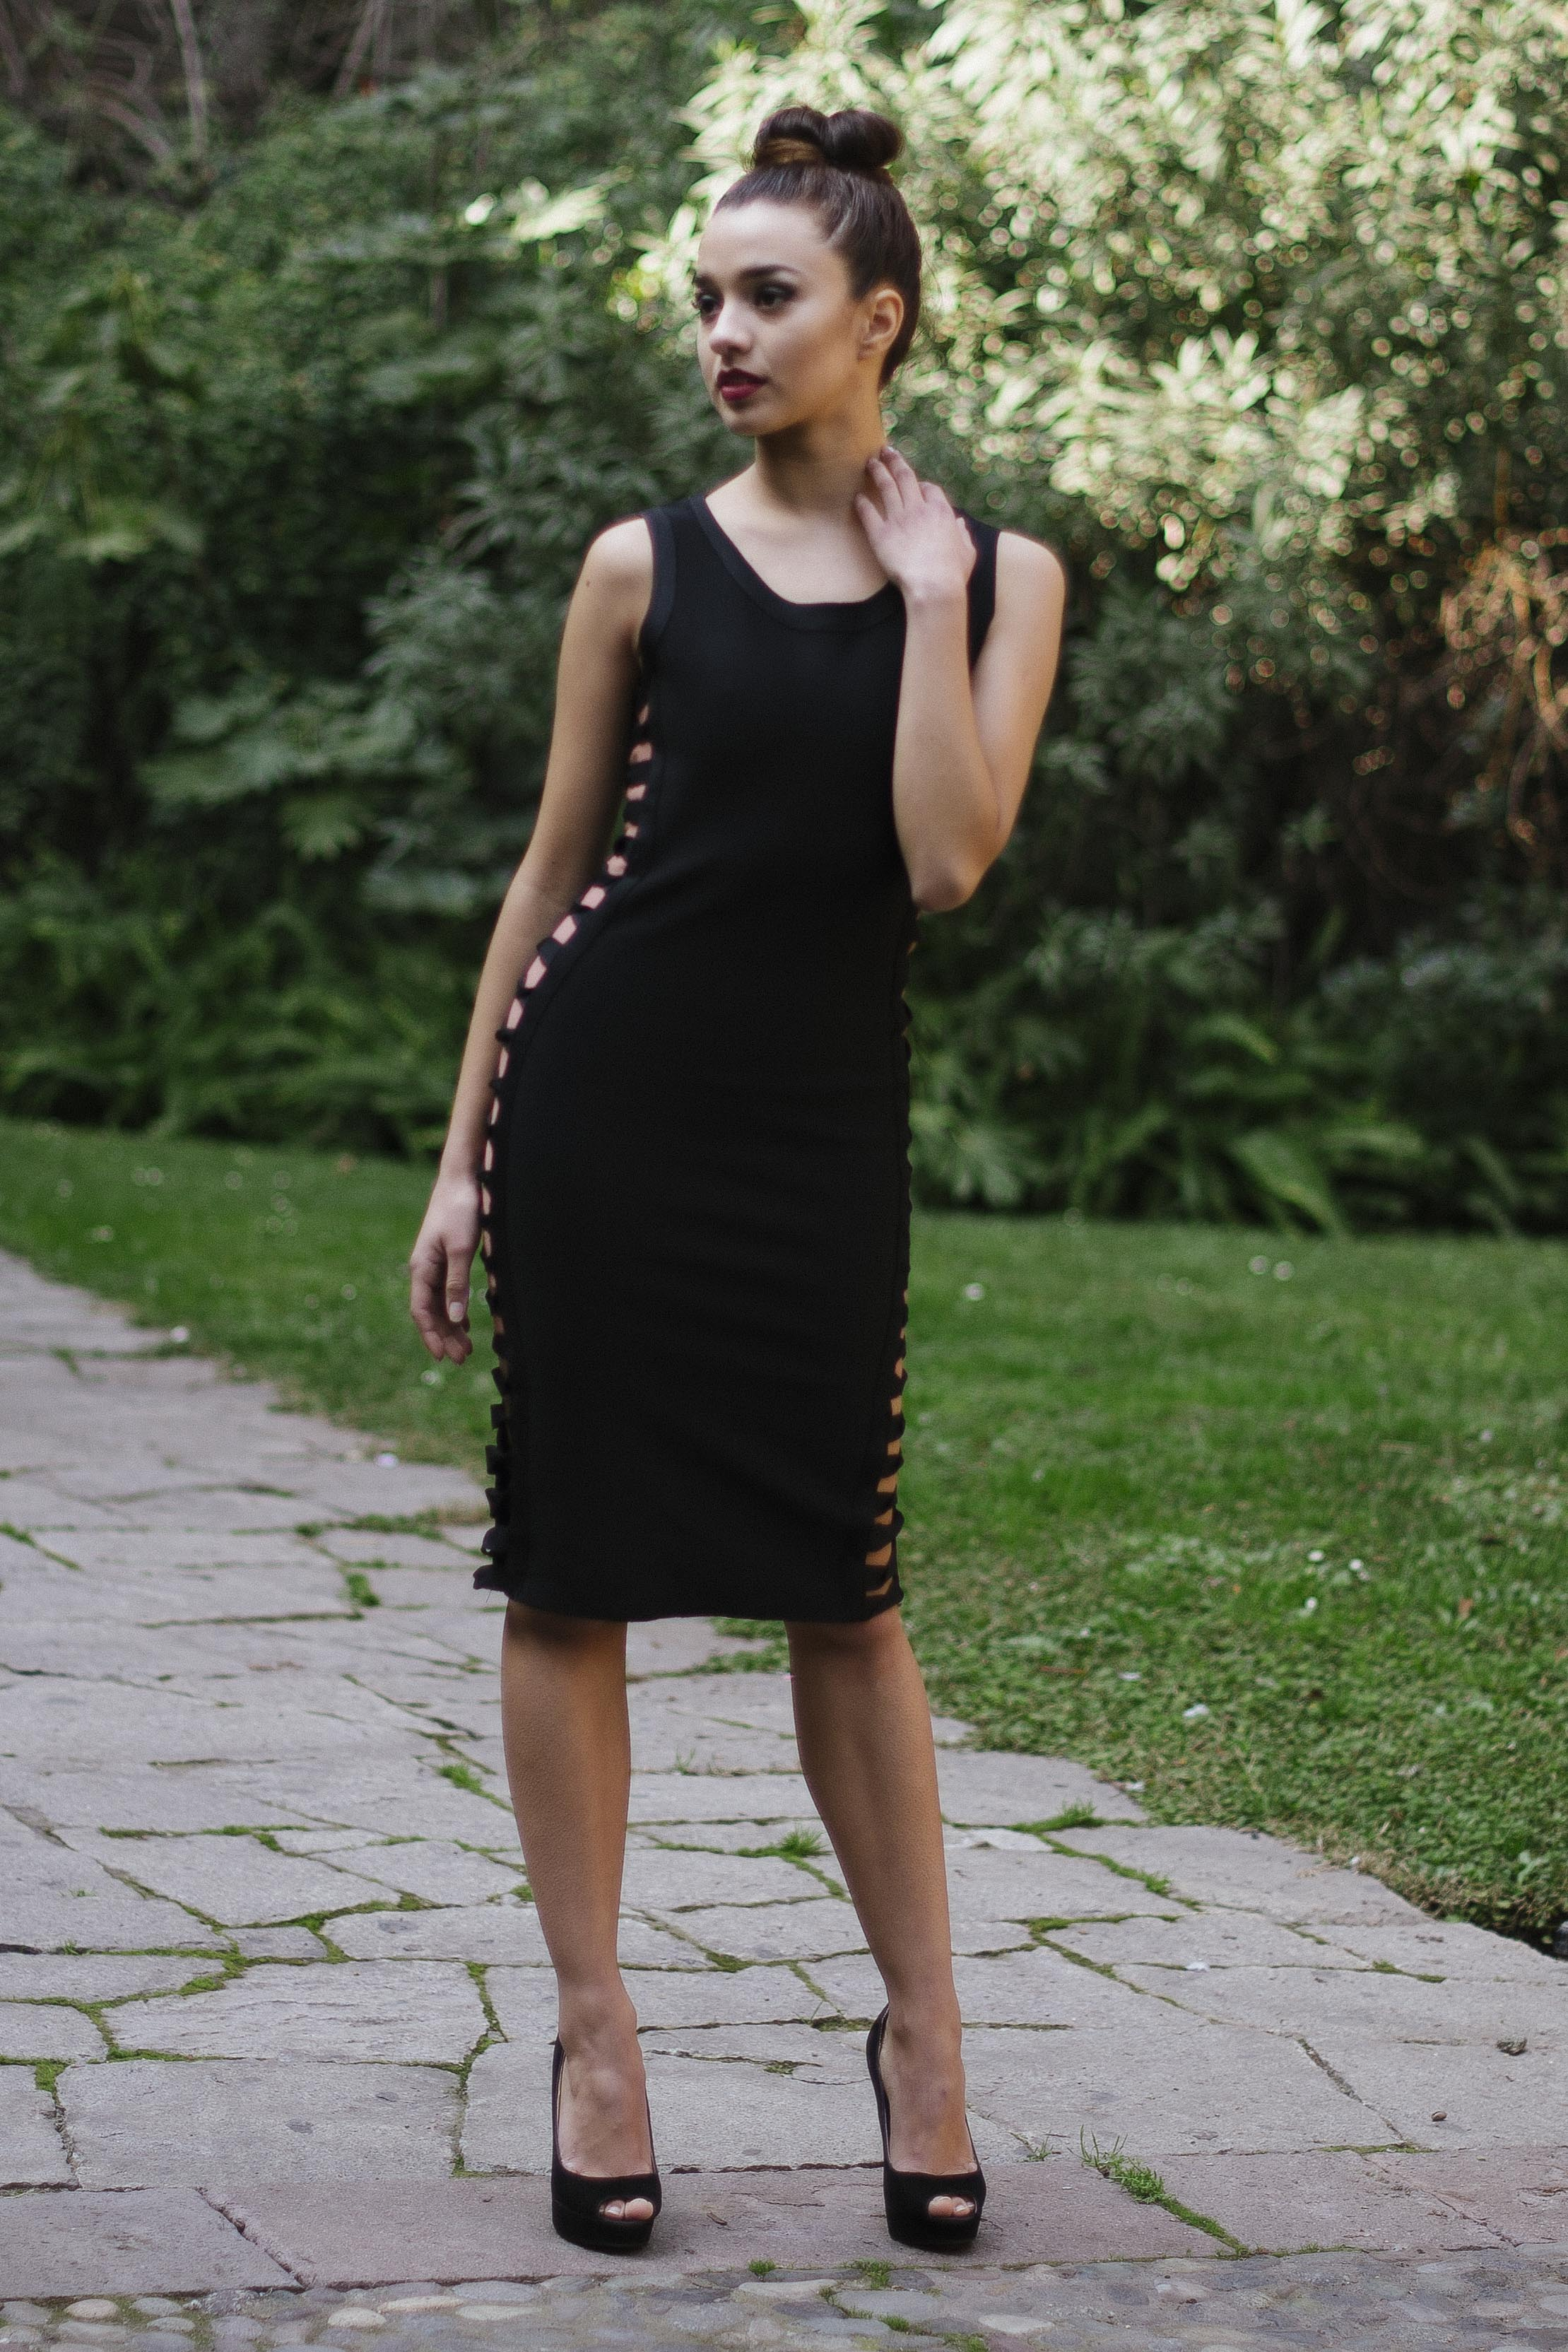 Sensual Black Dress 2